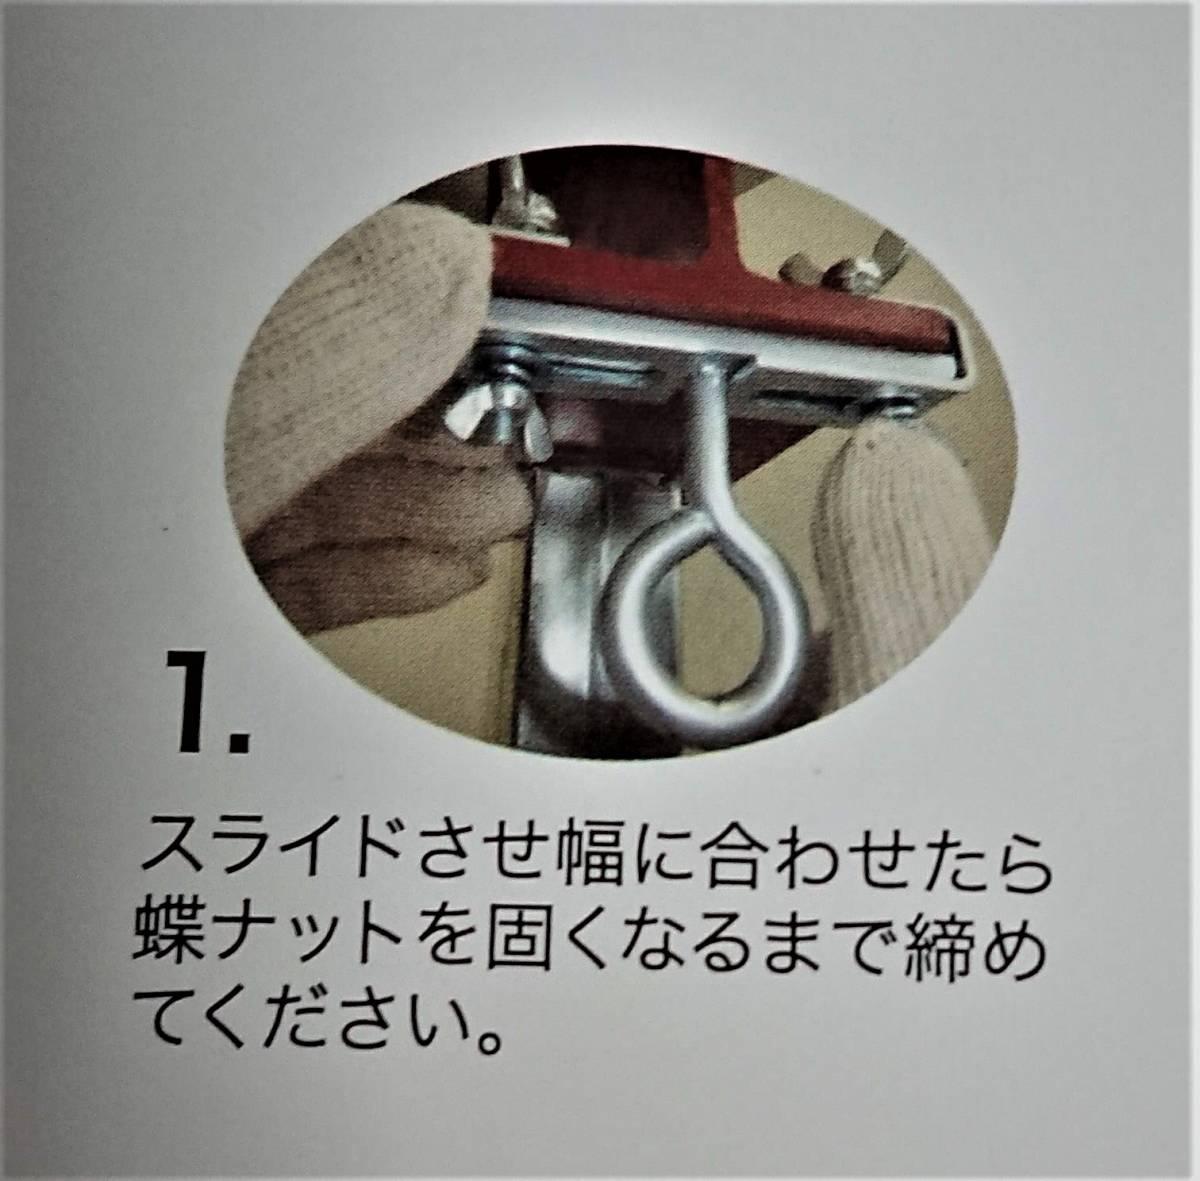 H鋼吊る~す(小) H鋼吊り金具 H鋼吊るす ヒートン_画像2